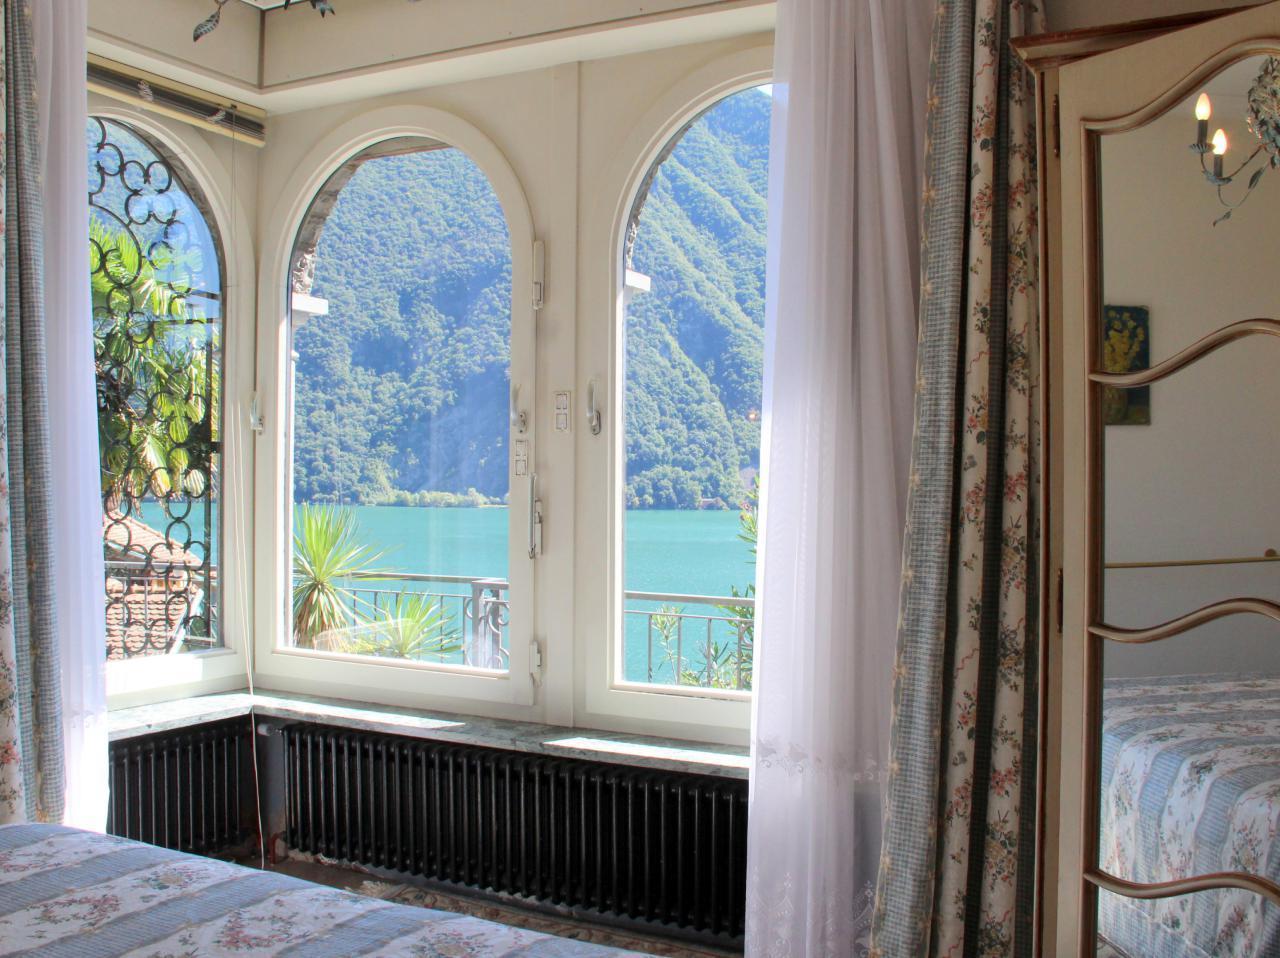 Ferienhaus Barony Luxus-Villa Castagnola-Seenähe, Park, Klimaanlage, Hallenbad (304907), Castagnola, Lago di Lugano (CH), Tessin, Schweiz, Bild 8